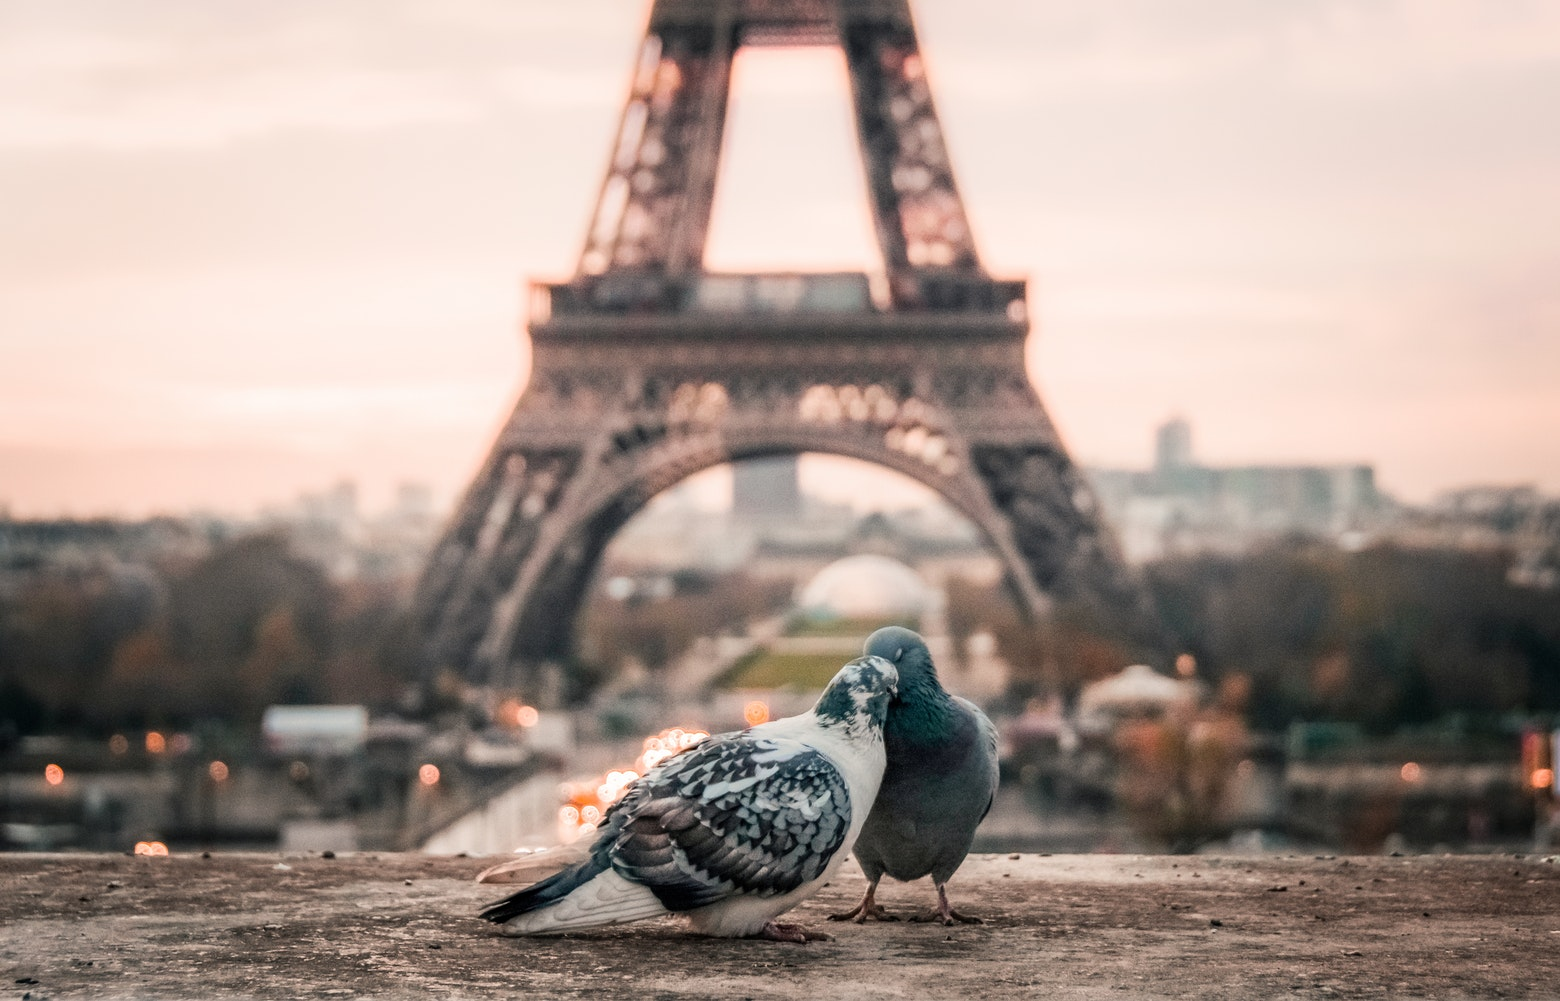 paris - romantic paris - places to go for new year's eve - new year's eve - nye - fabrizio verrecchia - paris - paris love - eiffel tower - in love at the eiffel tower - tour d'eiffel - pigeons - kissing